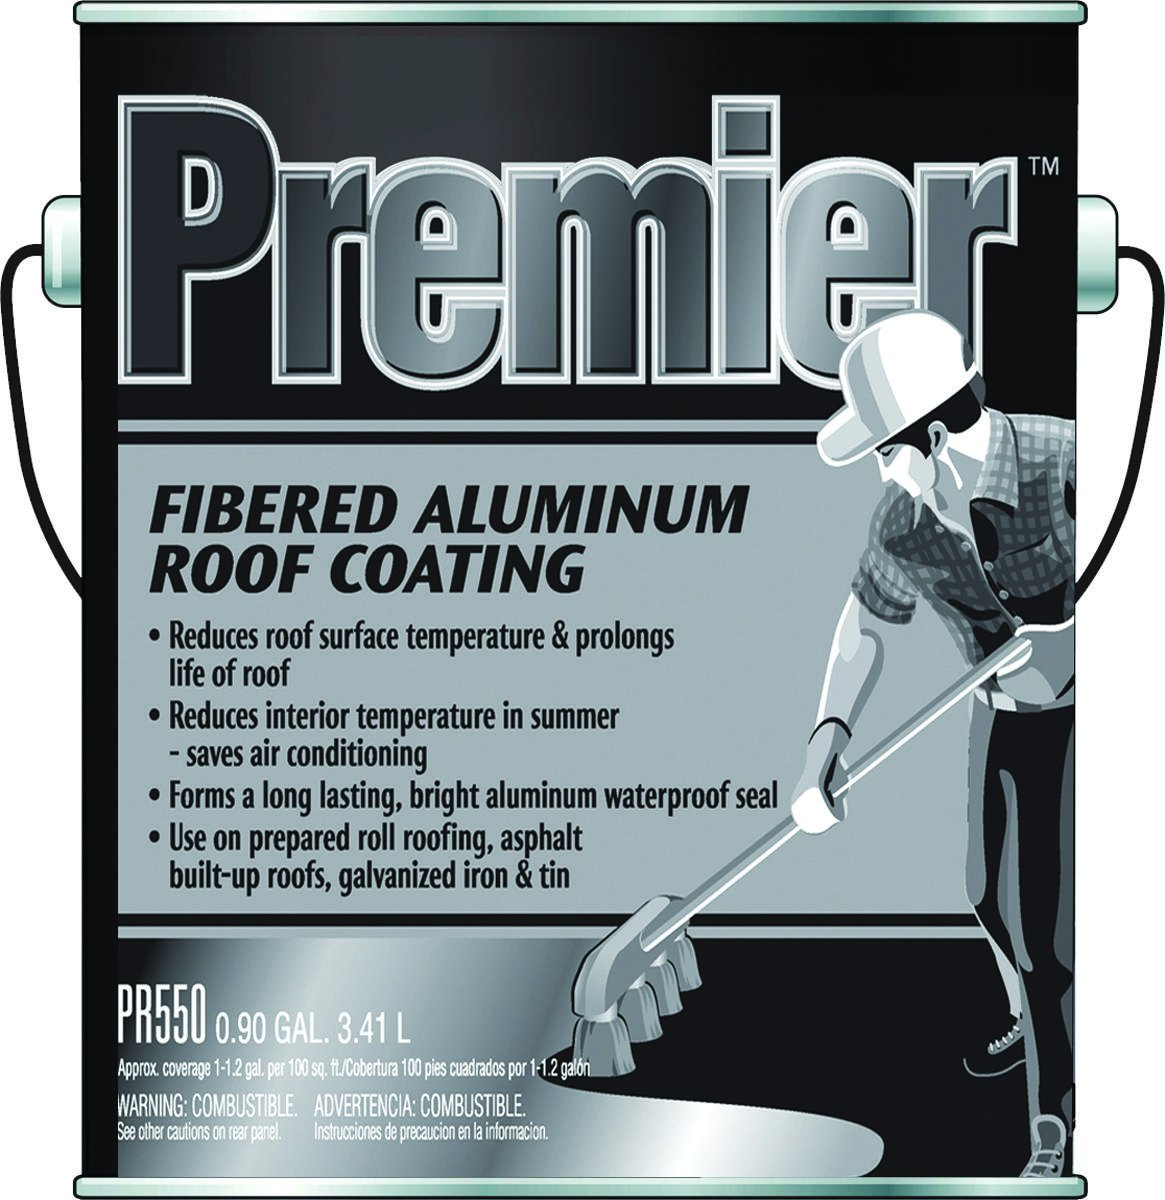 Henry Premier Fibered Aluminum Roof Coating, 1 gal, Liquid, Black, Petroleum, 0.90 SG, 105 deg F Flash Point